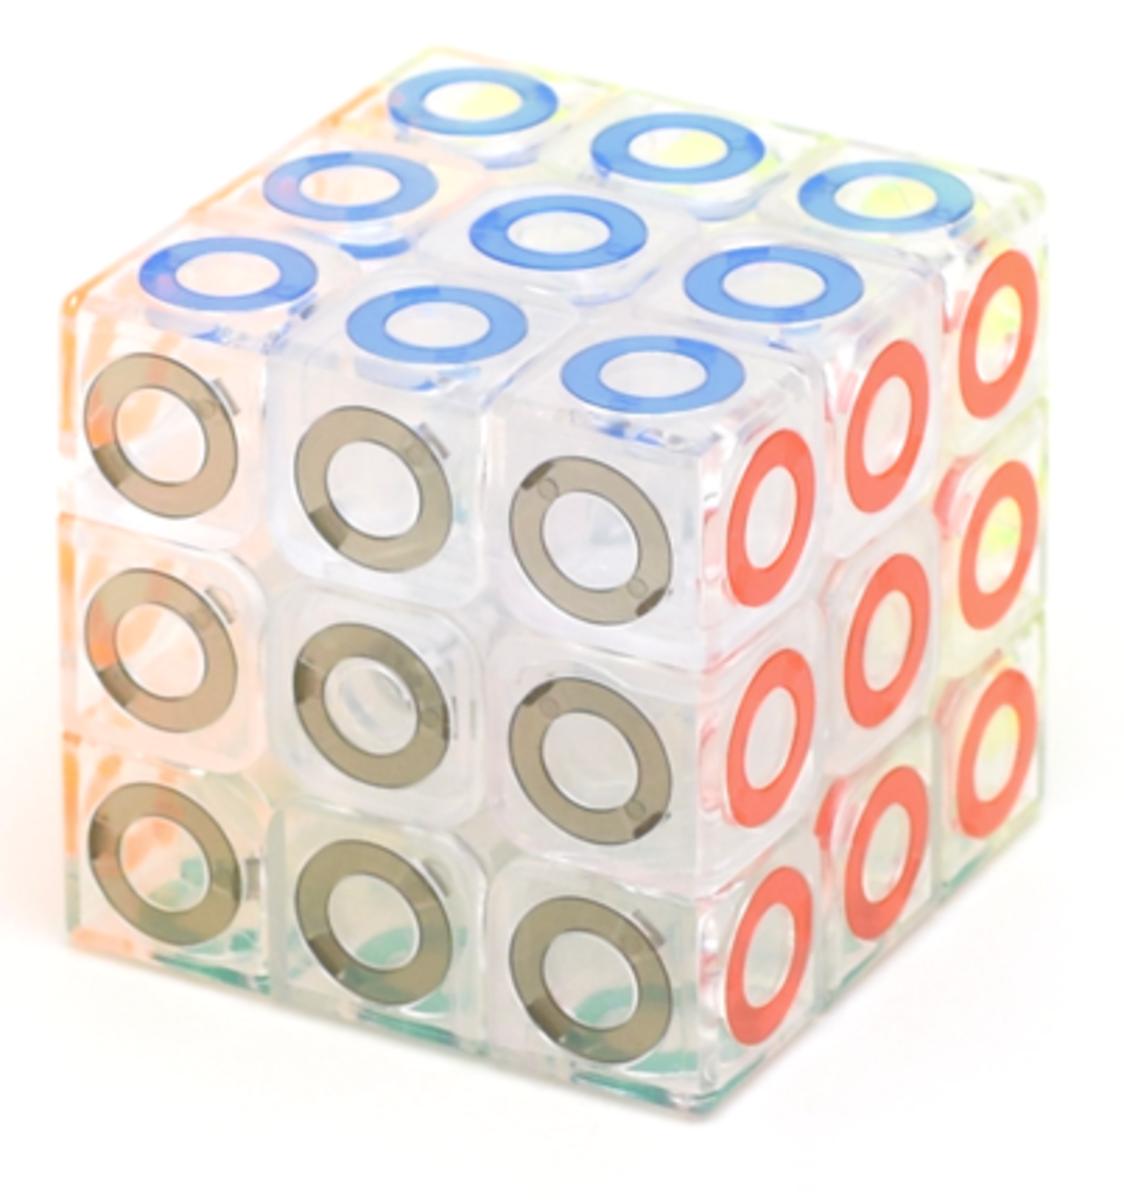 3x3x3 Crystal Ring MF